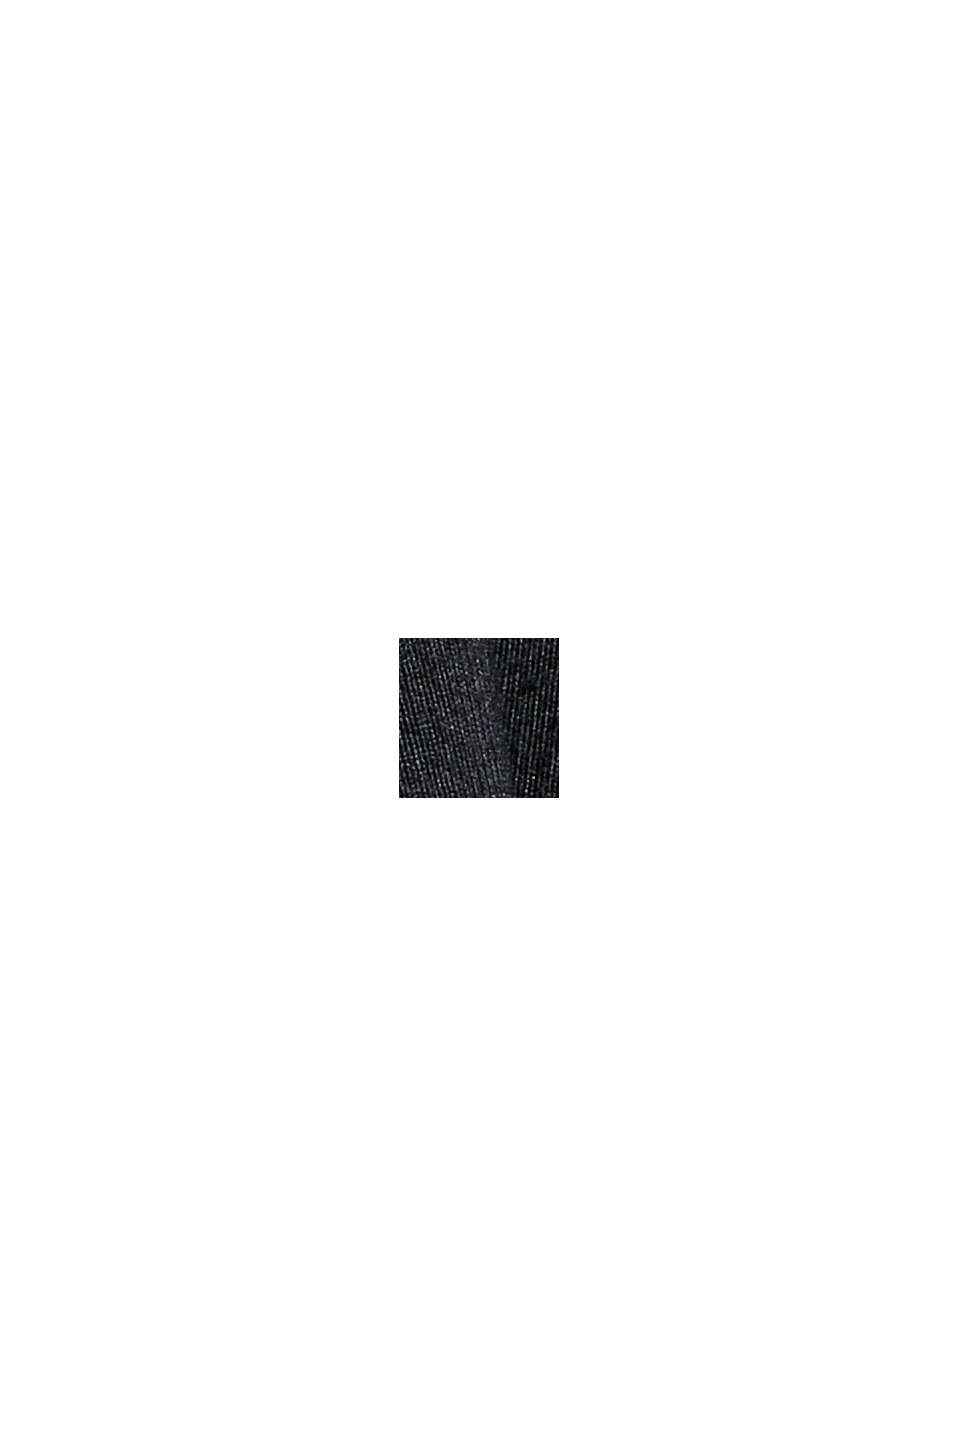 Leggings deportivos con bolsillos ocultos, BLACK, swatch